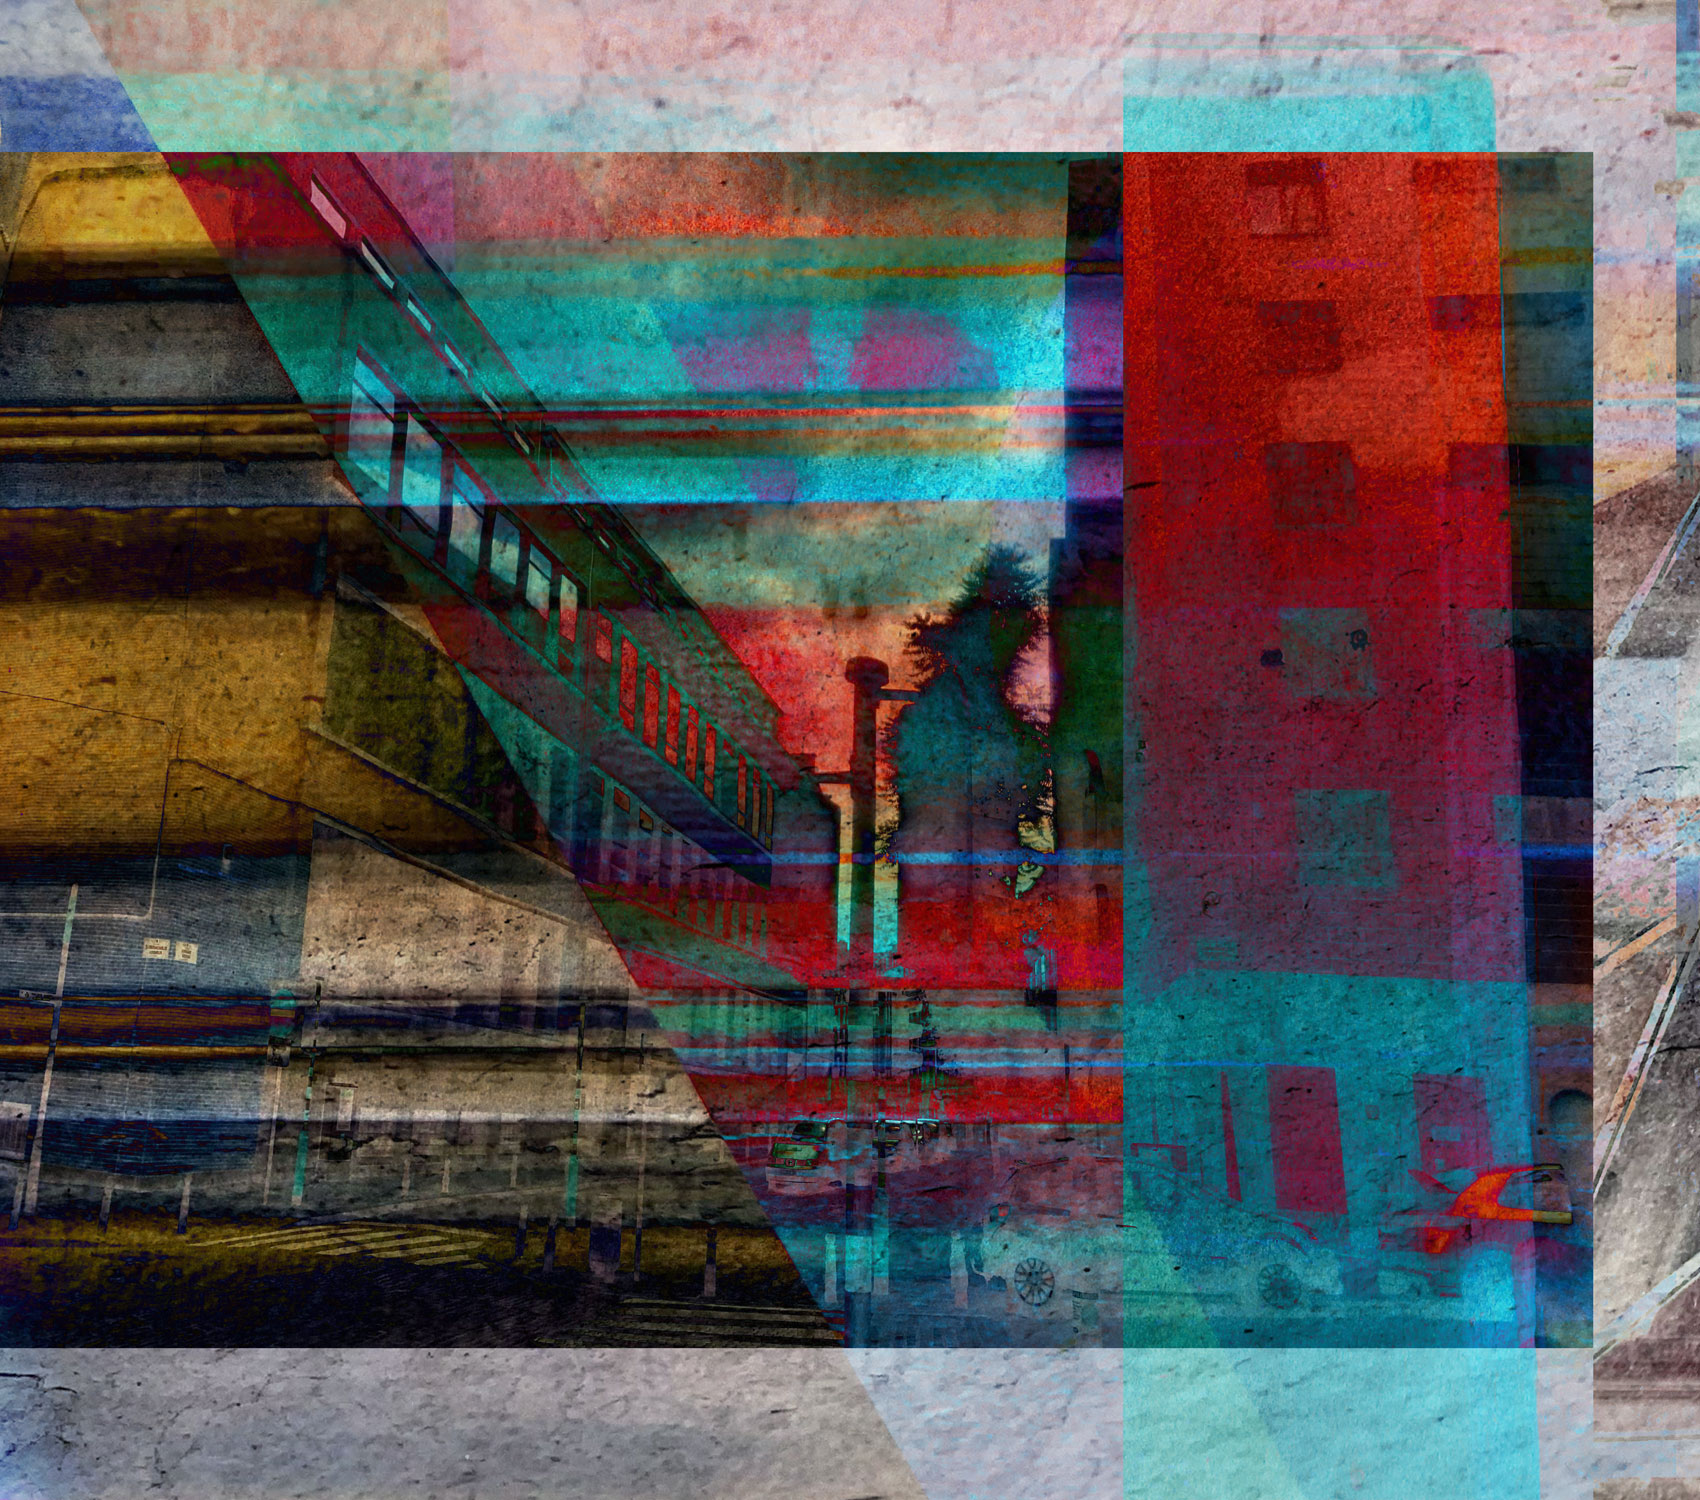 (20) Fragment 161 •75 x 66 cm (29.52 x 23.62 in)